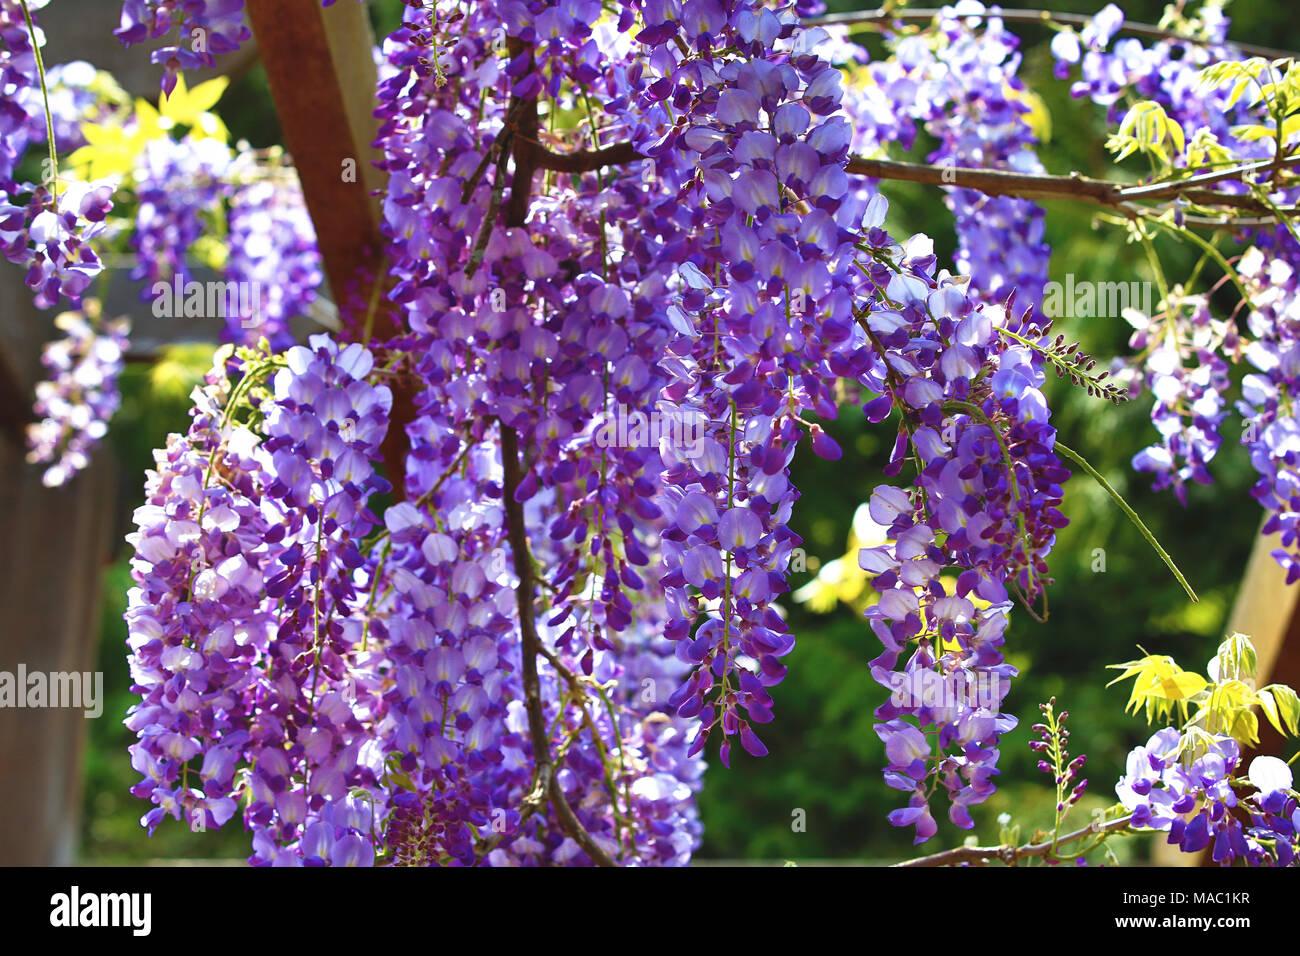 Purple Wisteria Flowersbeautiful Scenery Of Purple With Yellow